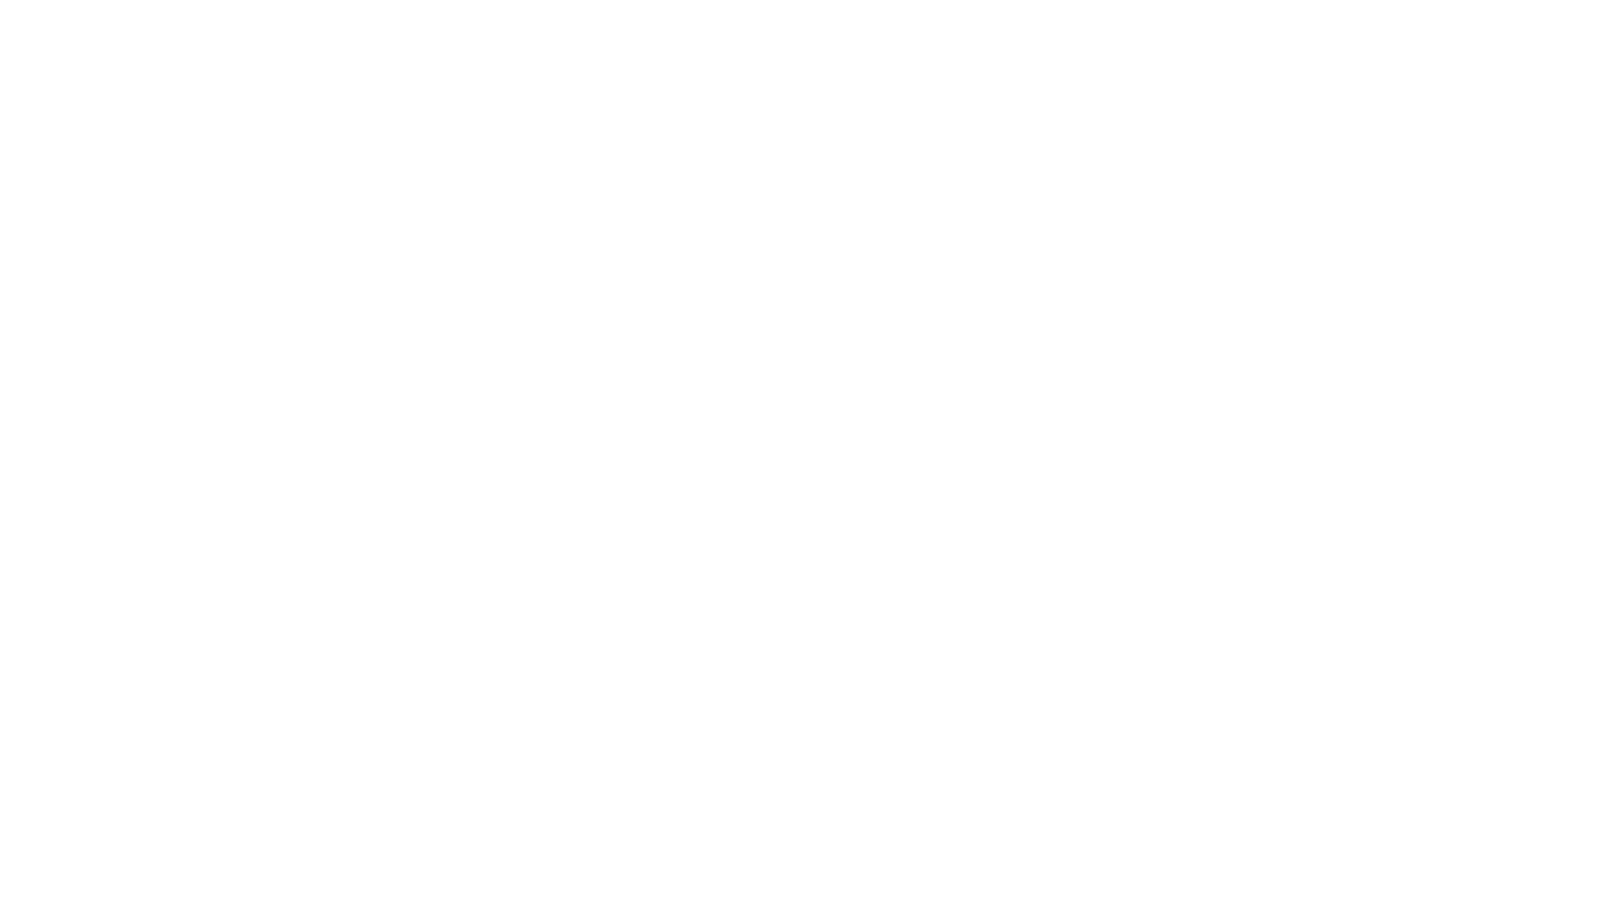 Silaturahmi Keluarga Besar PB PARFI Bersama Artis Senior. Sabtu 12 Juni 2021, Bertempat di Cafe ATM Waroeng Rakyat Nusantara, Bekasi - Jawa Barat.  Acara berlangsung khidmad, meriah namun tetap melaksanakan protokol kesehatan, seperti menggunakan masker setelah berswafoto dan ketika berbicara, menjaga jarak saat makan, dan mencuci tangan. Prokes juga dilakukan dengan pengecekan suhu badan terlebih dahulu sesuai dengan jadwal acara.  #PARFIberkibar #PARFIbersinar #PARFIsemakinbaik